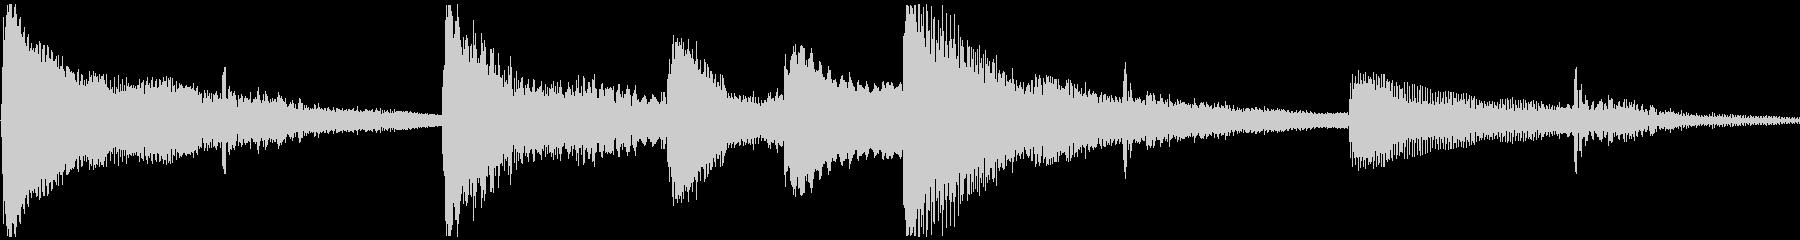 <Loop>ゆったり ピアノ②の未再生の波形